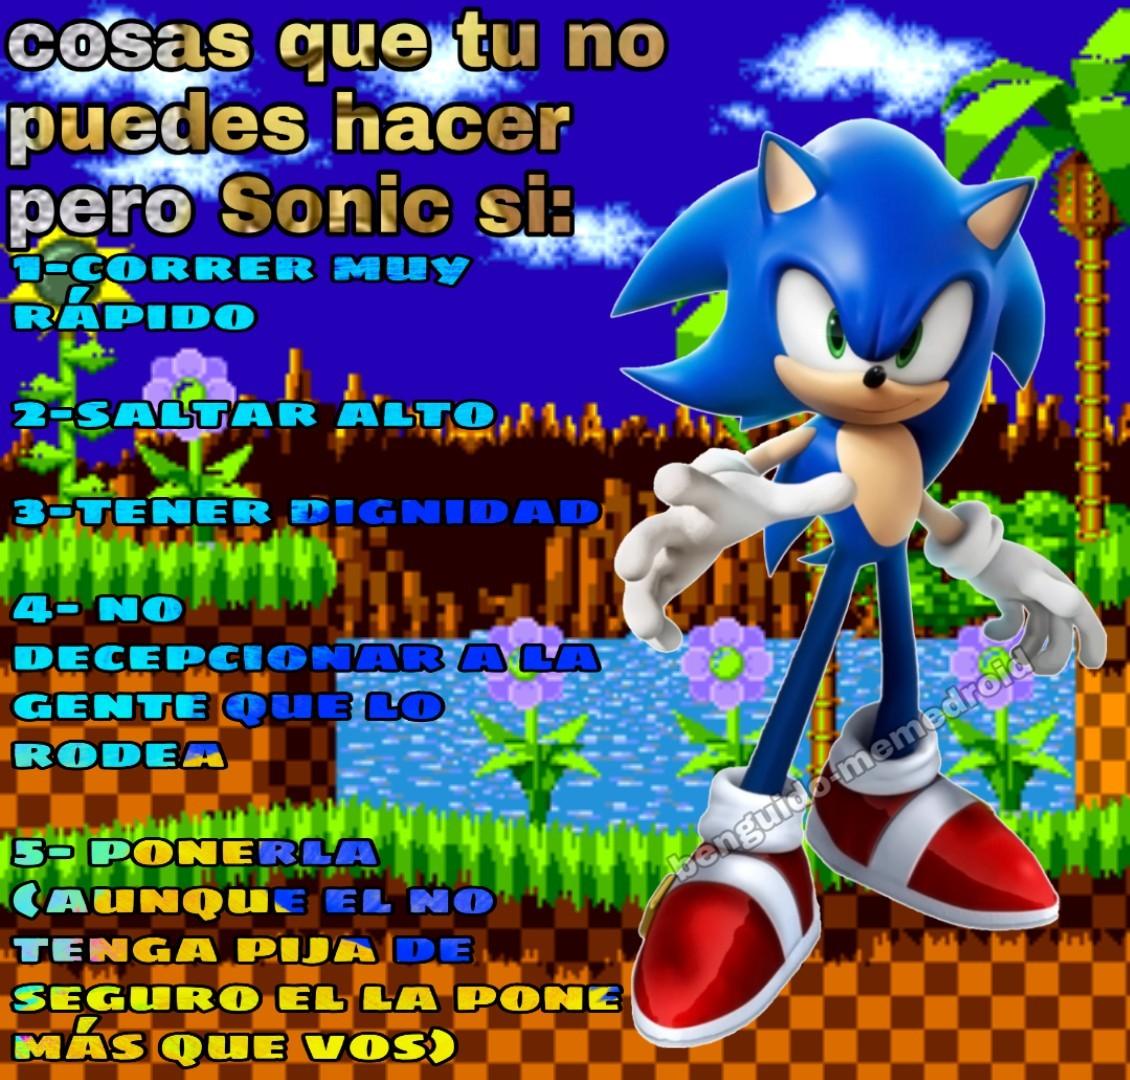 Alto crack el Sonic - meme